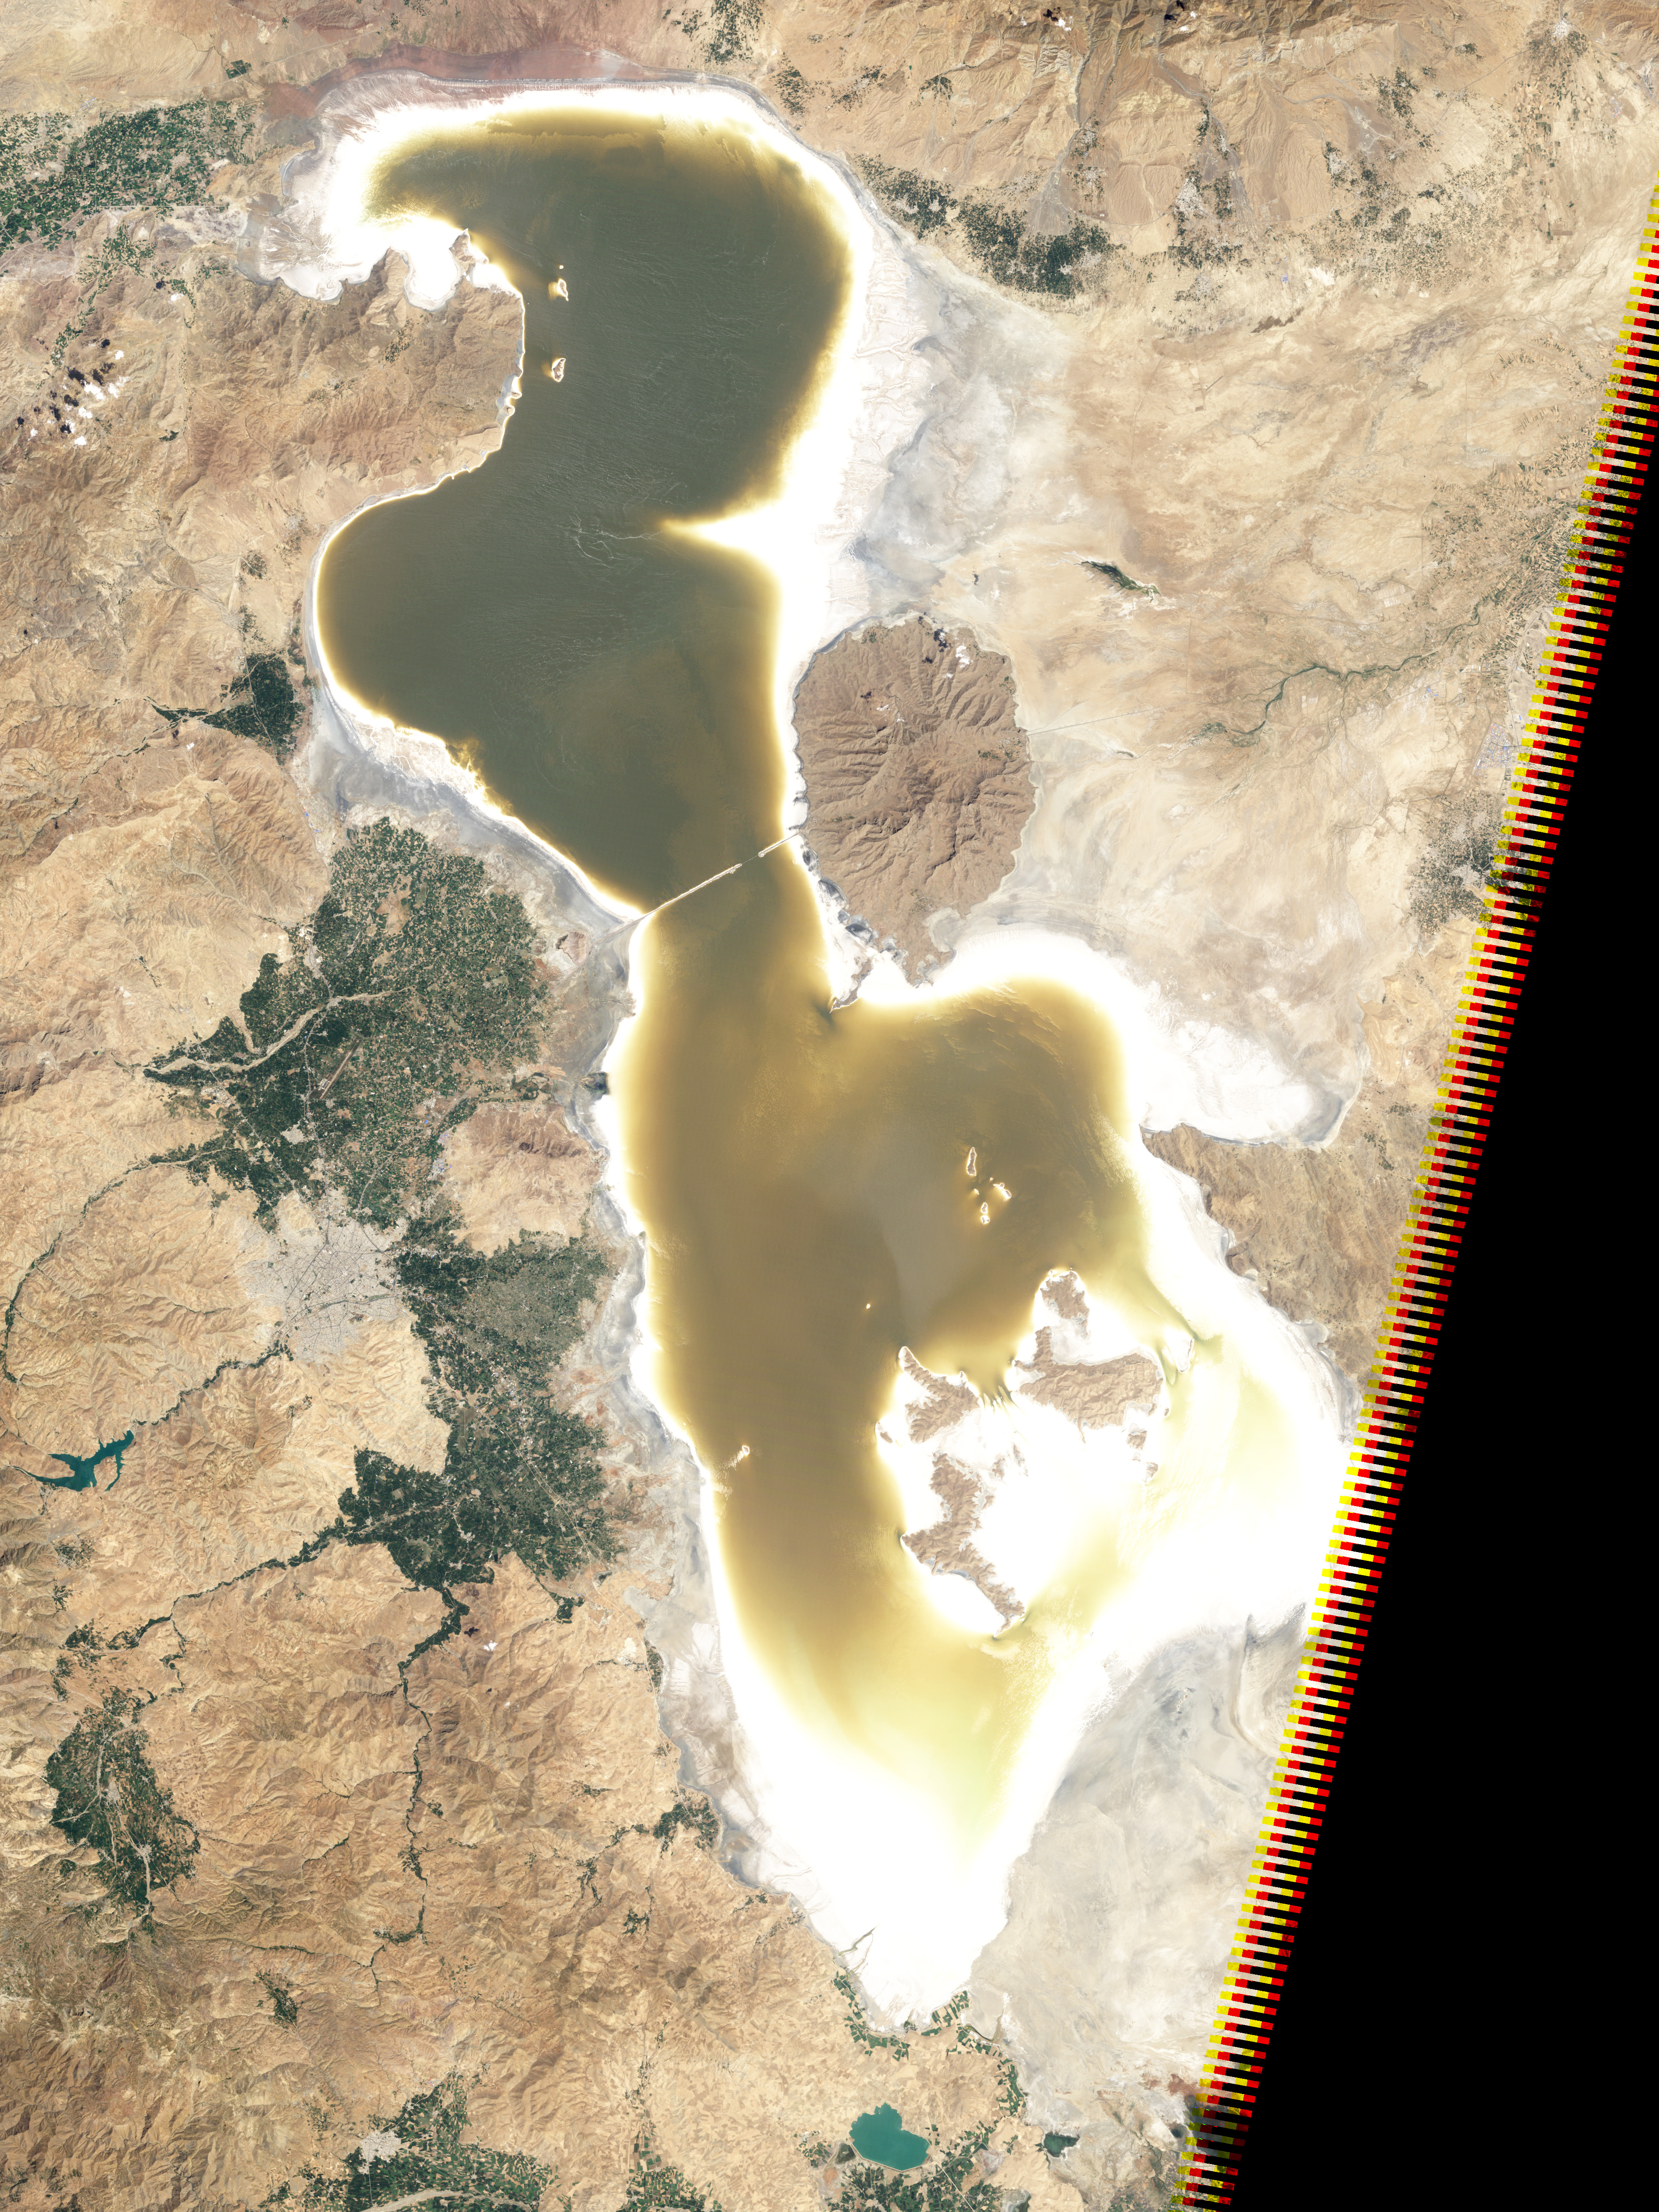 Lake Orumiyeh Iran Image of the Day